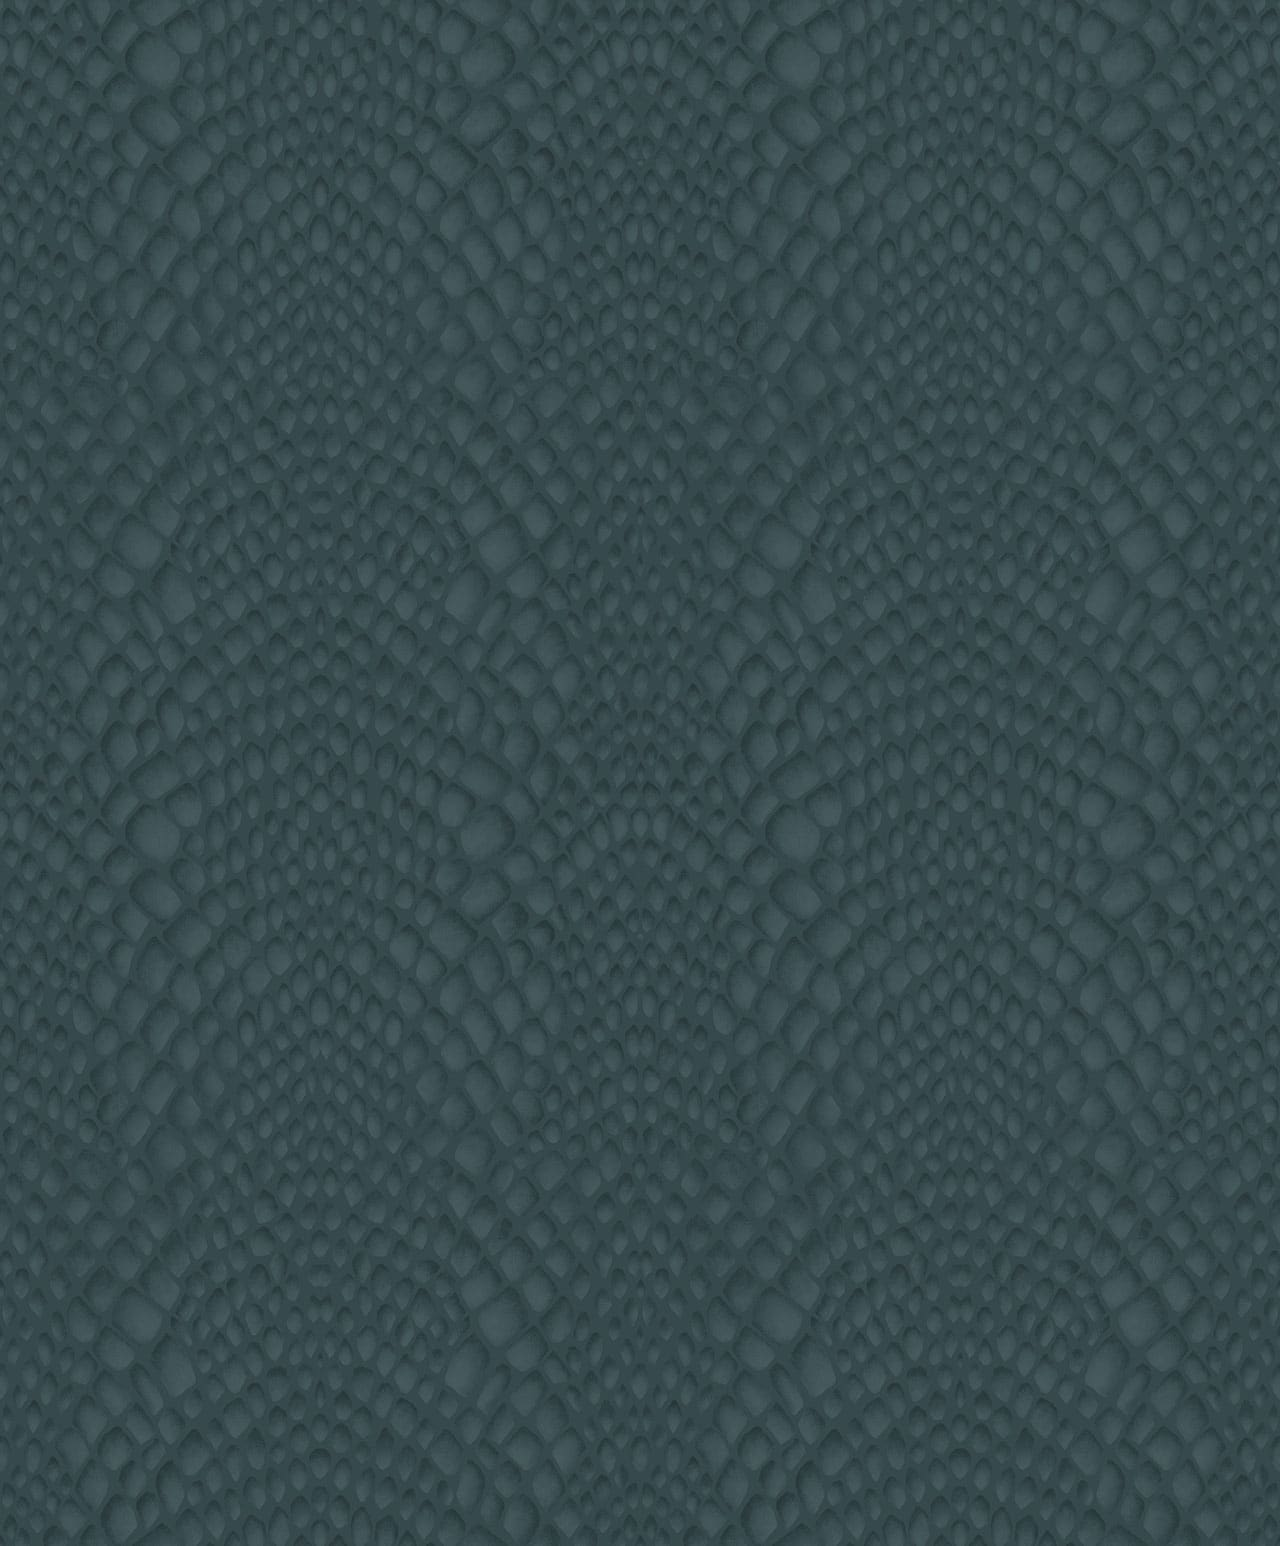 LIPARI AMAZON TEAL A-LP00310